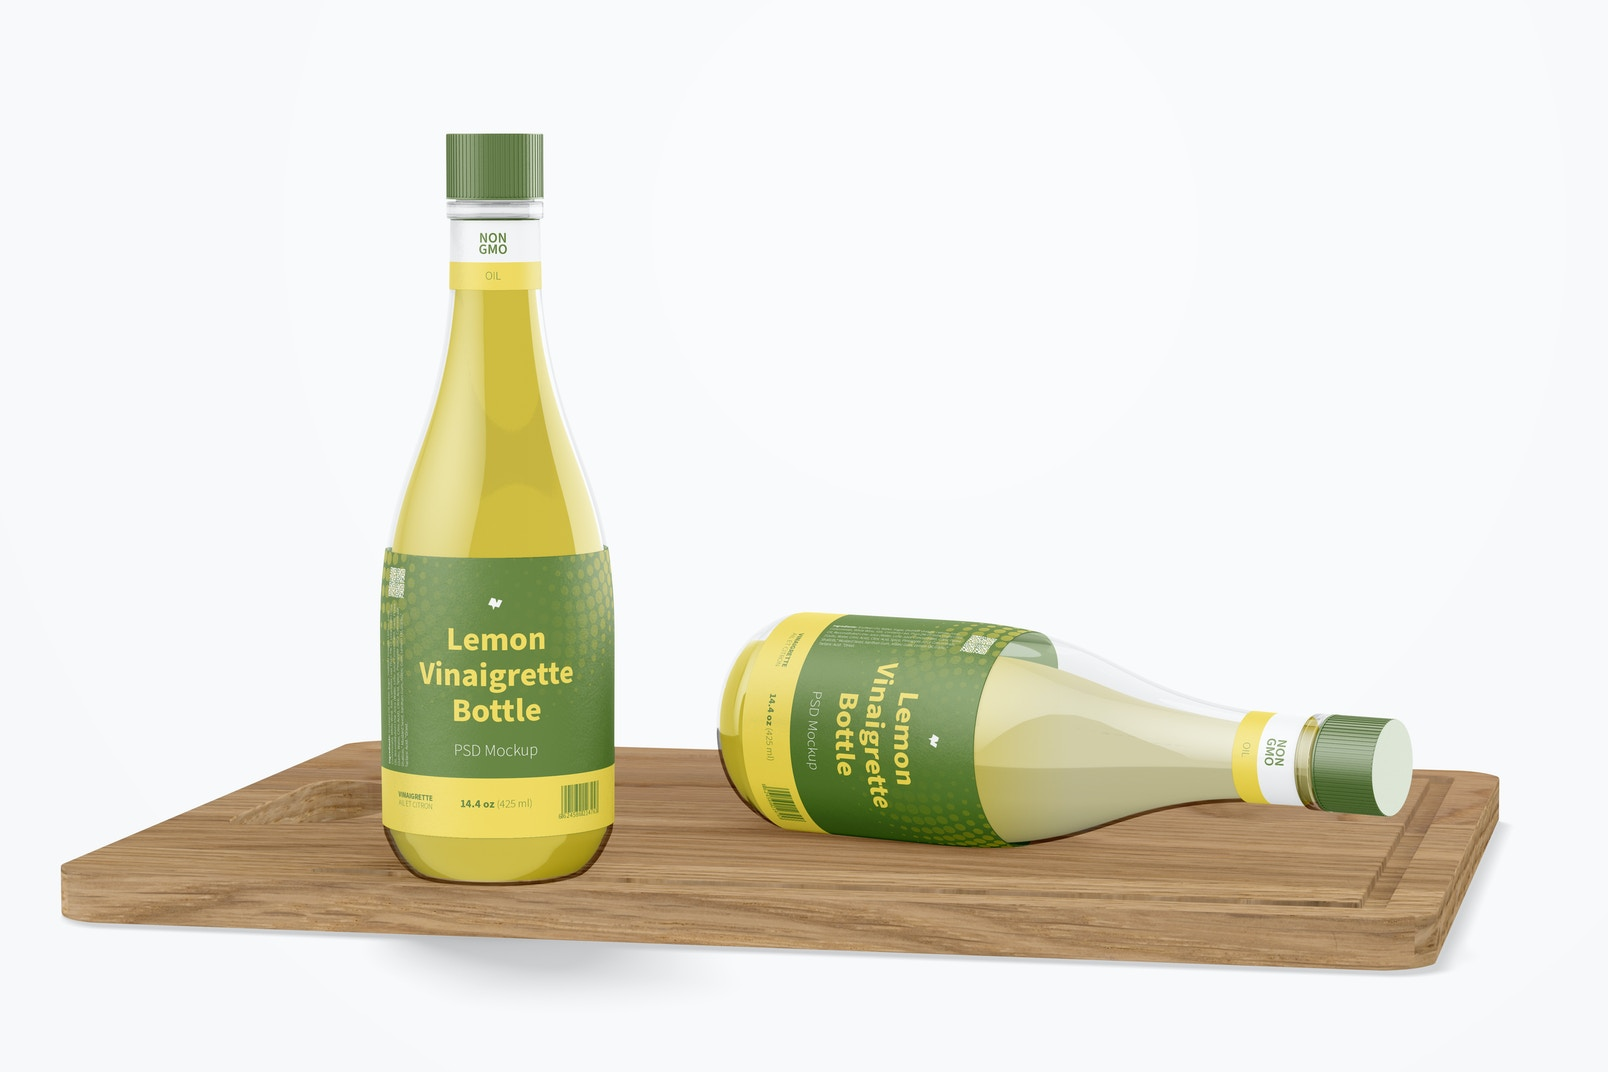 14.5 oz Lemon Vinaigrette Bottle Mockup, Standing and Dropped